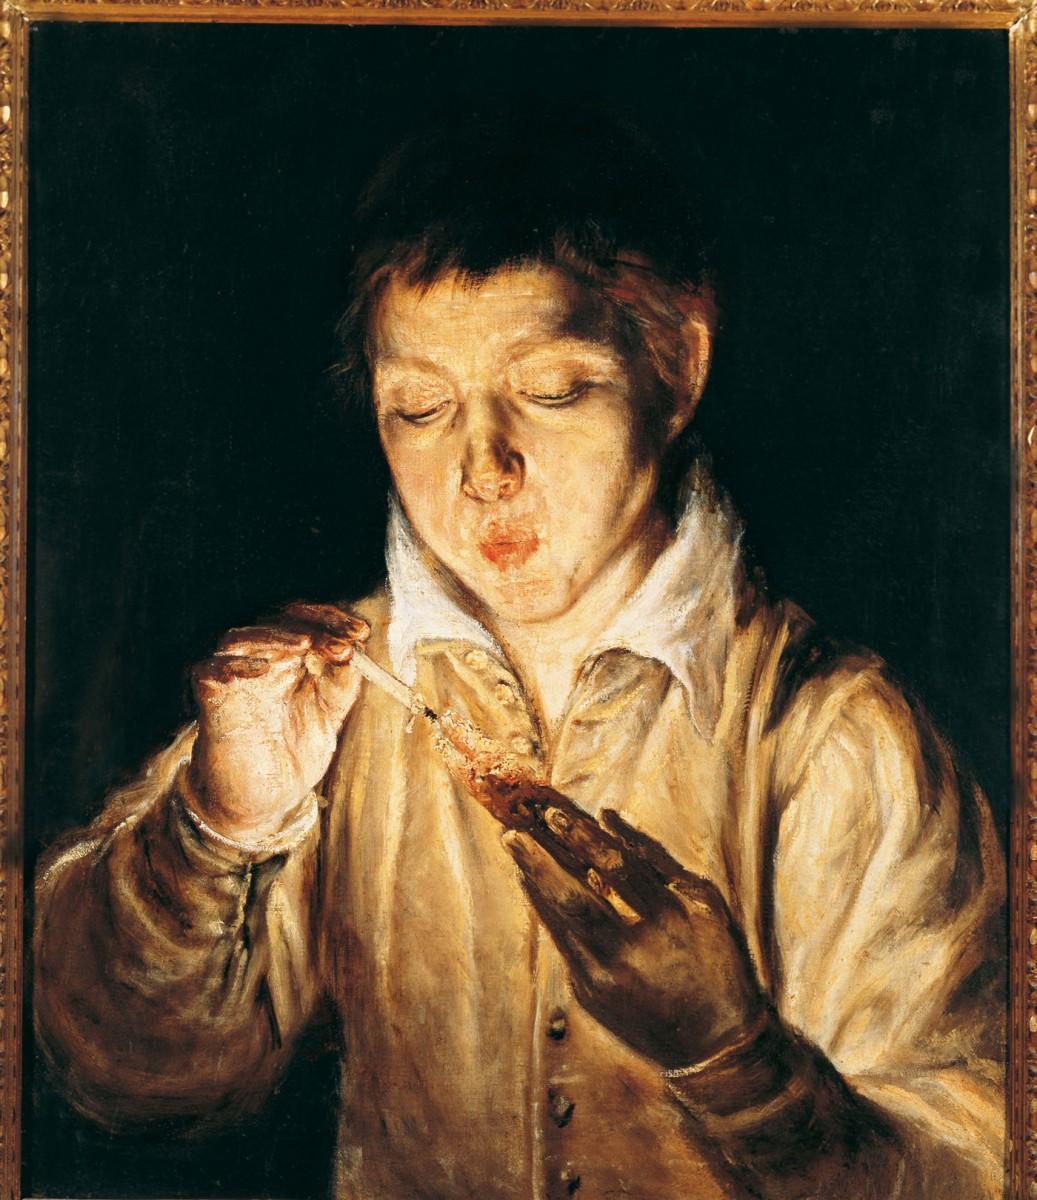 El Greco, A boy blowing a candle (Soplόn) 1570-72. Museo Nazionale di Capodimonte, Naples.